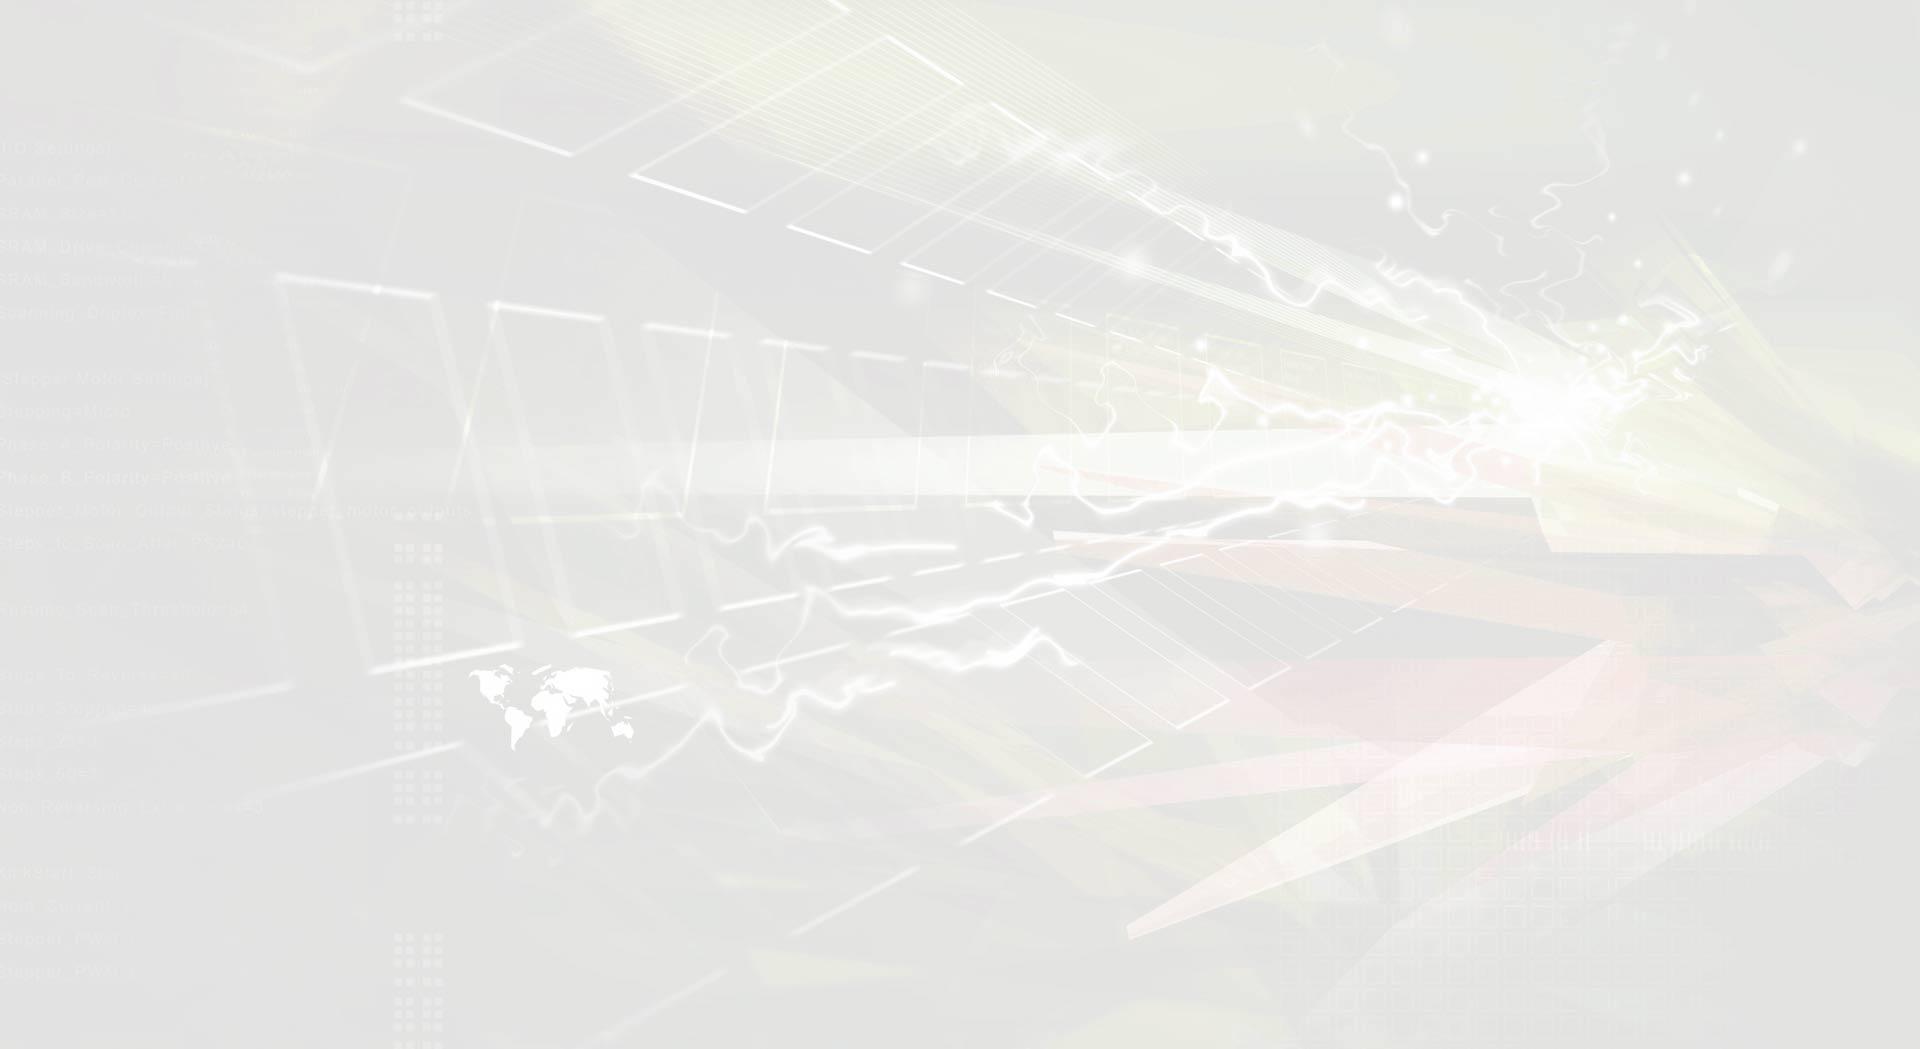 sfp-modules_green-1